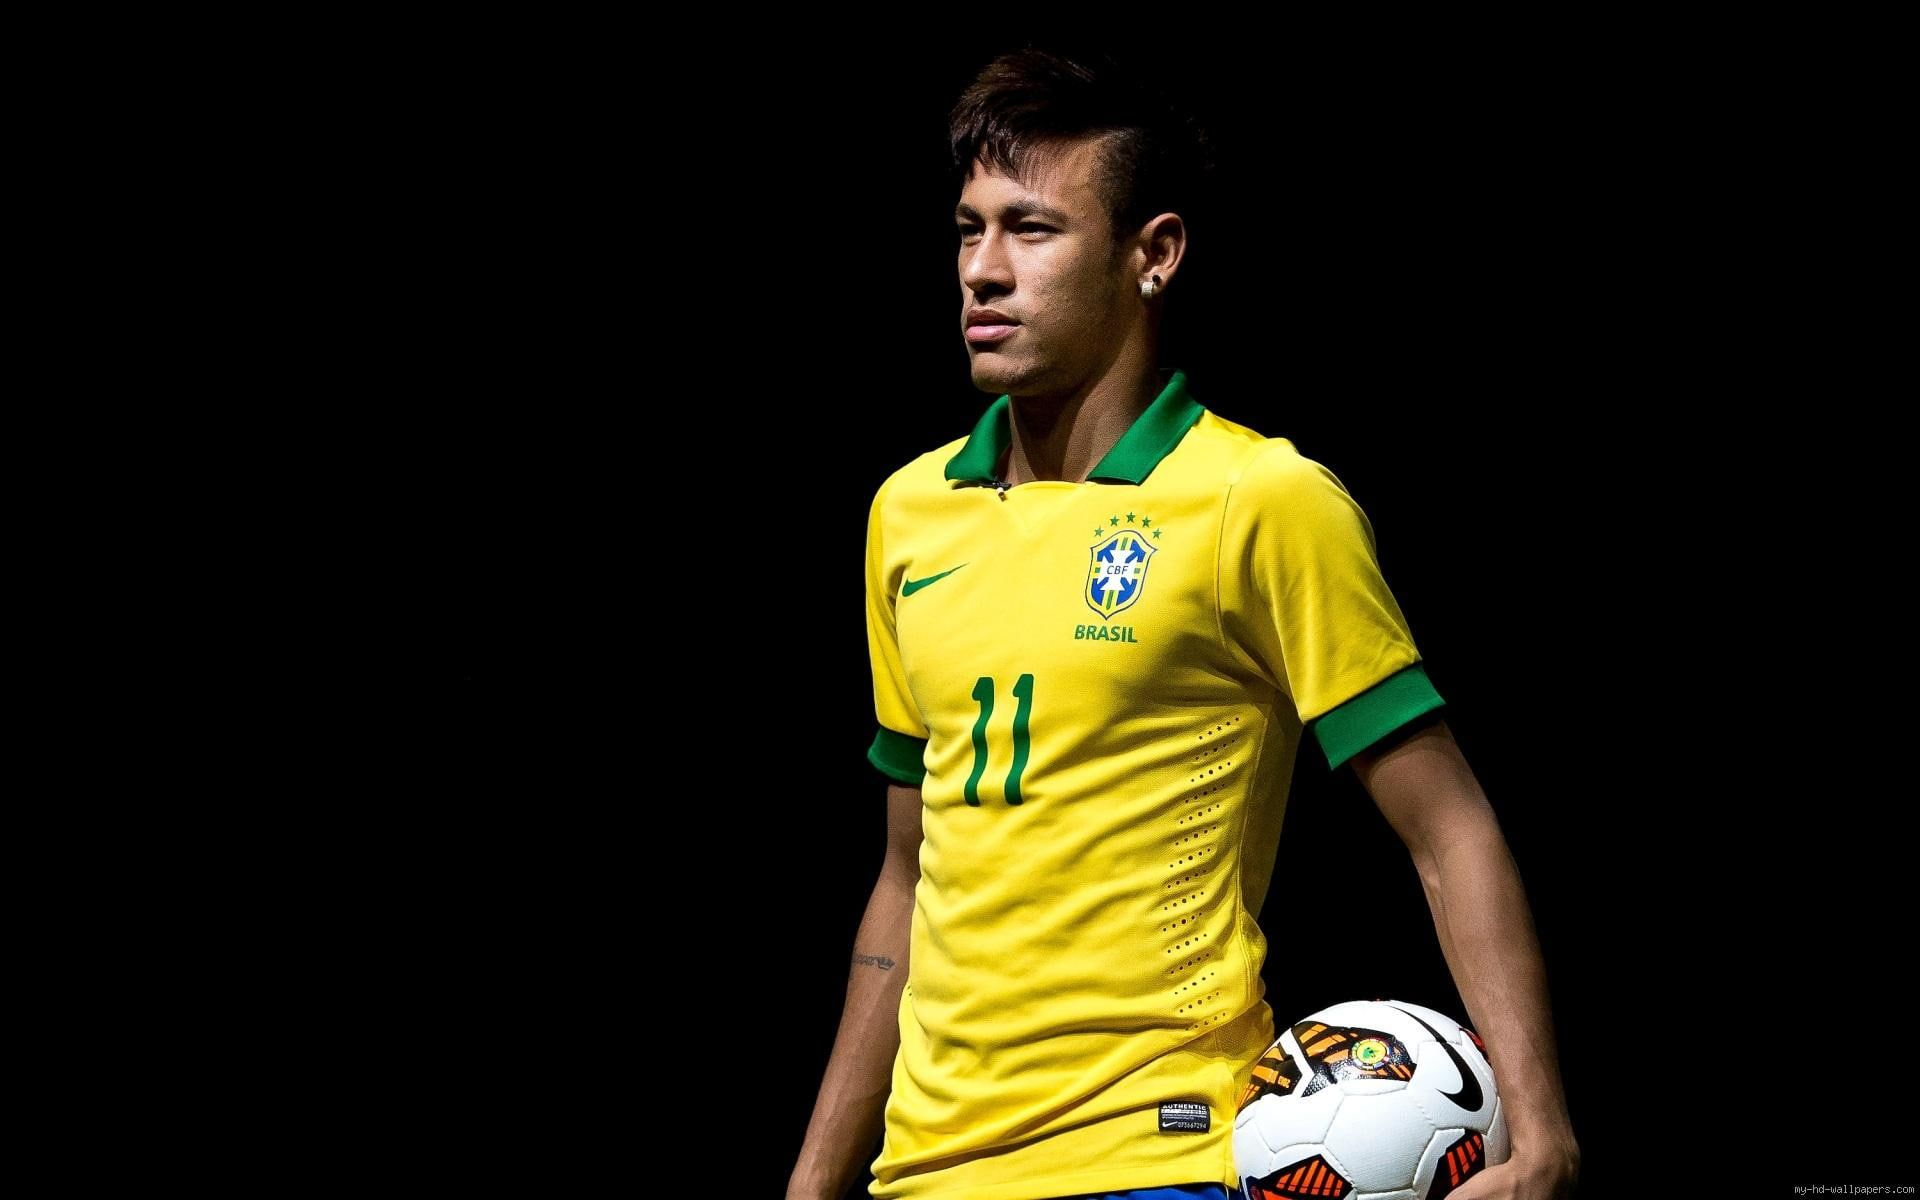 Neymar 2014 Fifa World Cup Men S Yellow And Green Nike Soccer Jersey Shirt Neymar Football Fifa 2014 Sport Celebr In 2020 Neymar Nike Soccer Jerseys Nike Soccer